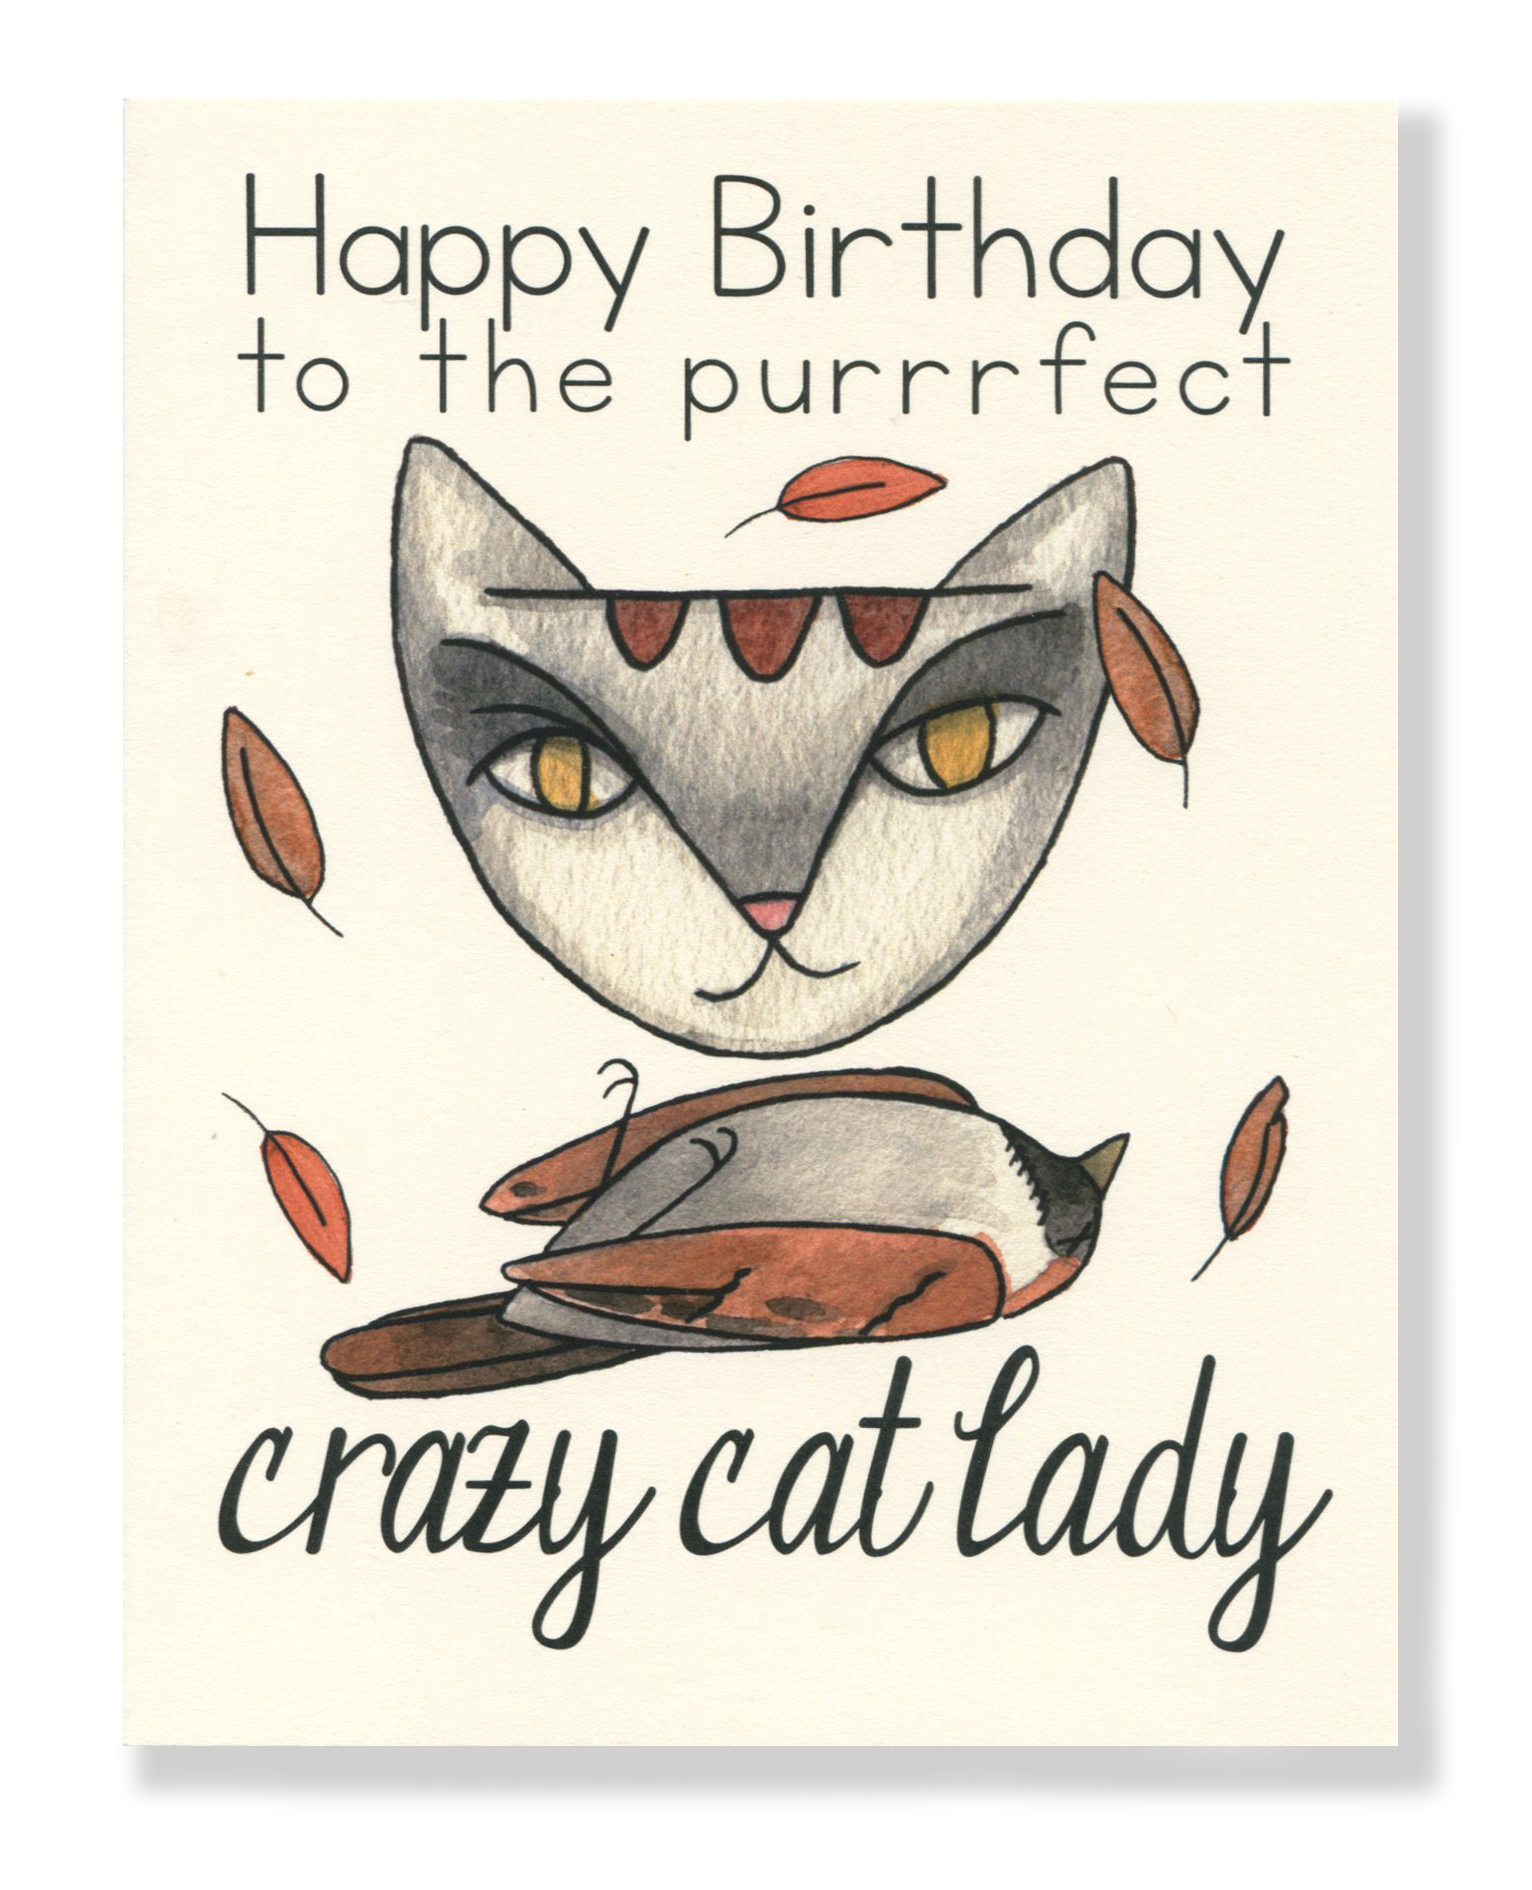 Happy birthday cat card. Crazy clipart crazy lady